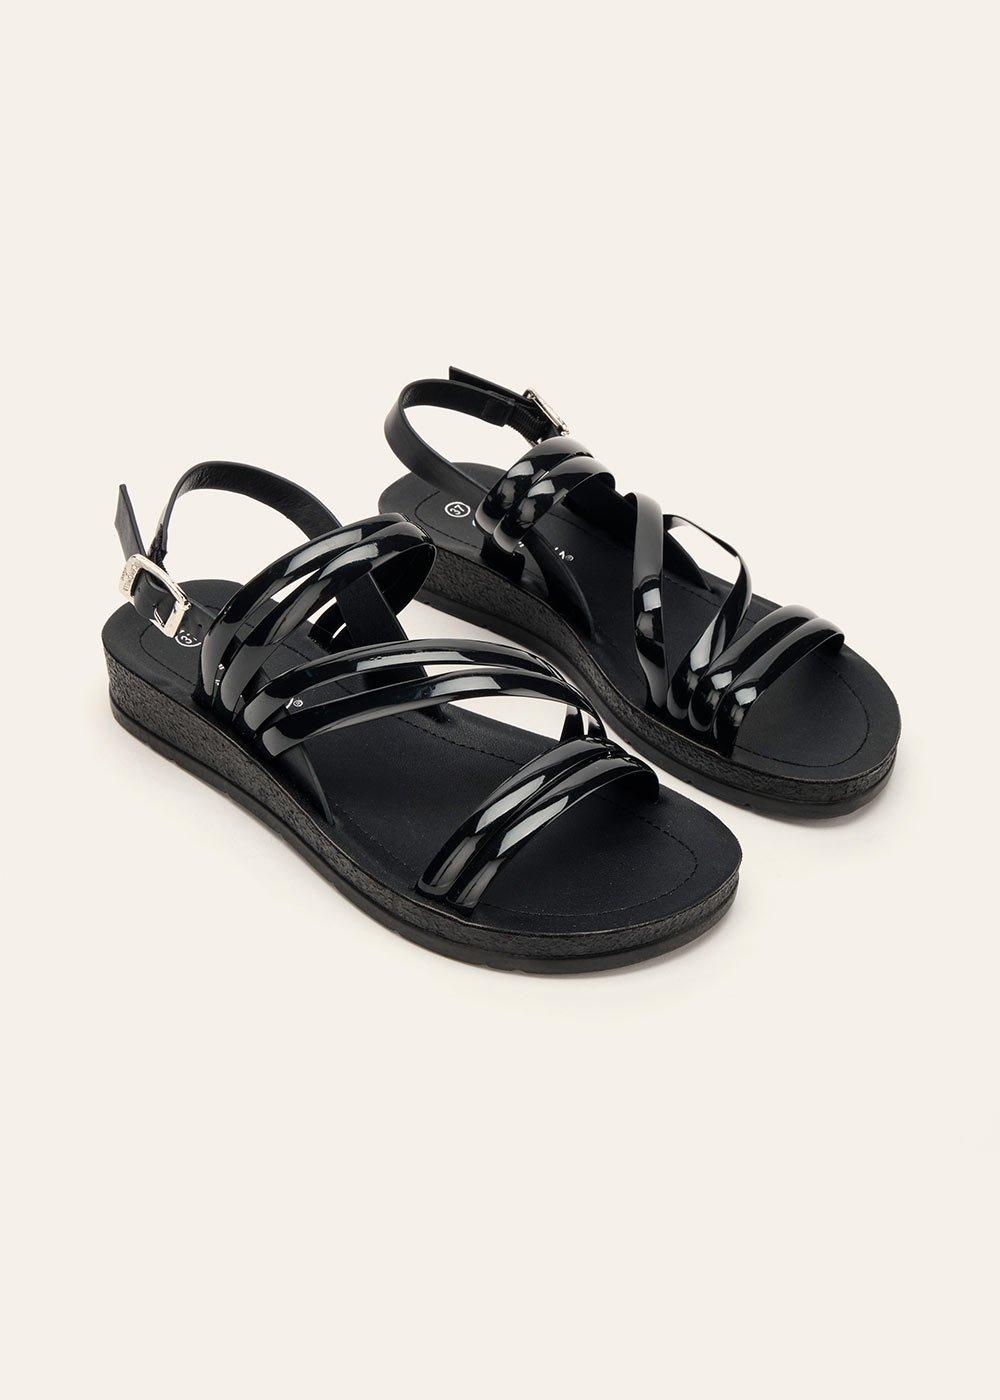 Steyla beach sandal with vinyl bands - Black - Woman